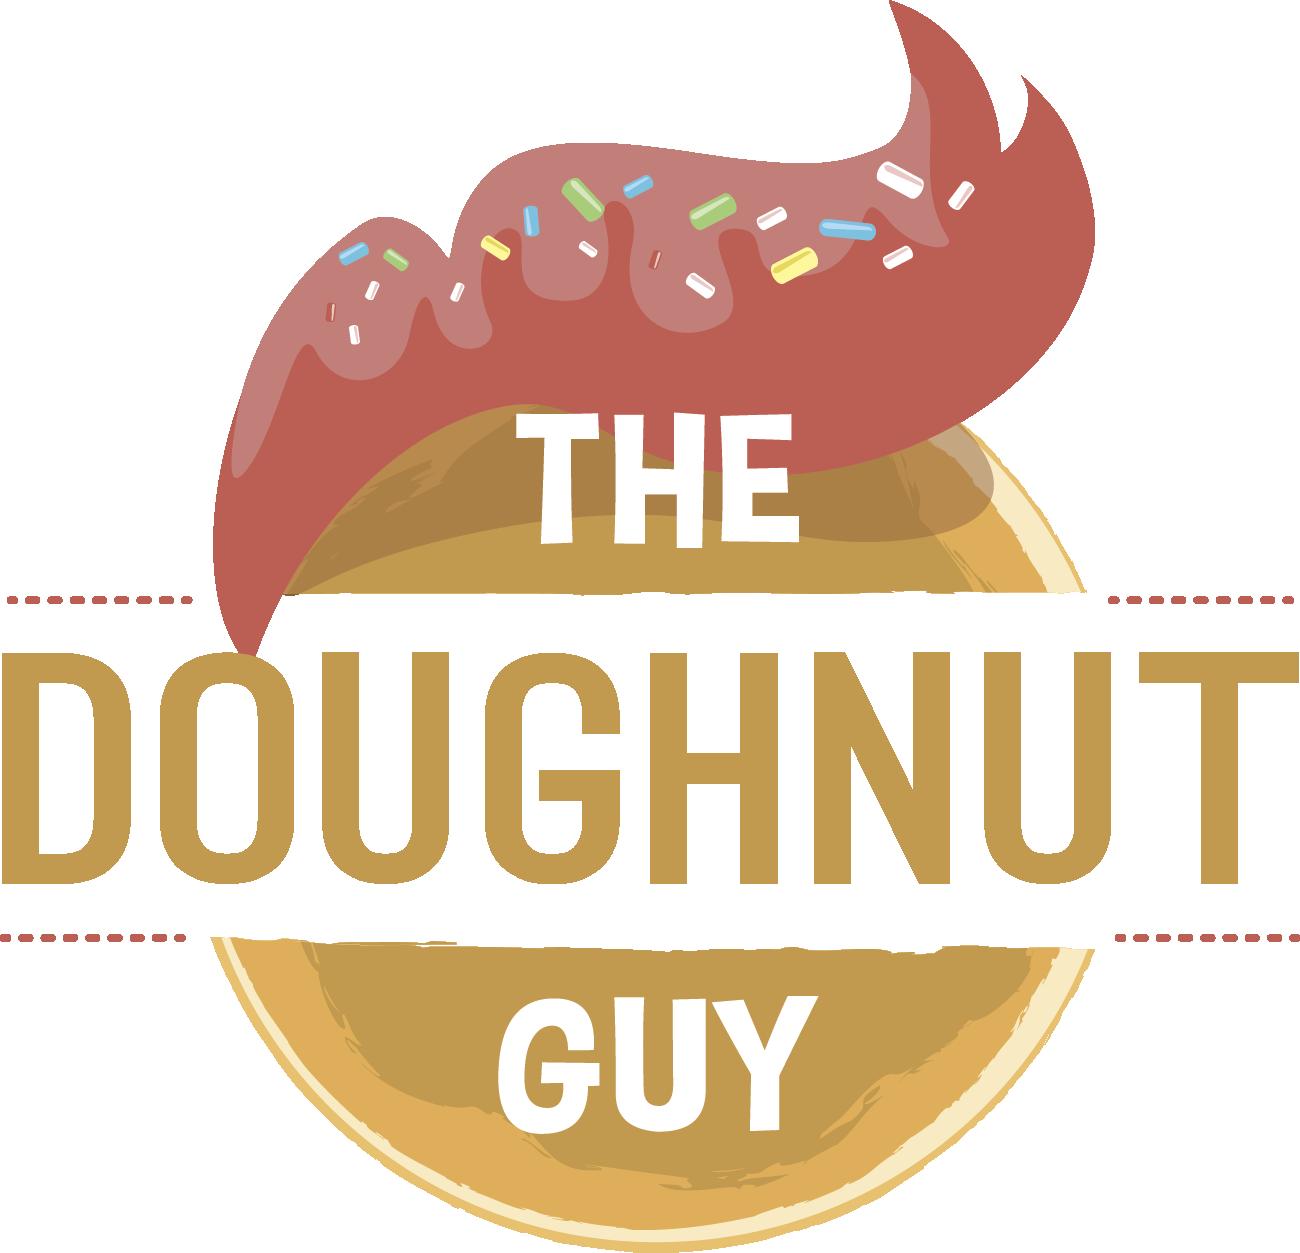 Doughnut clipart donut man. The guy